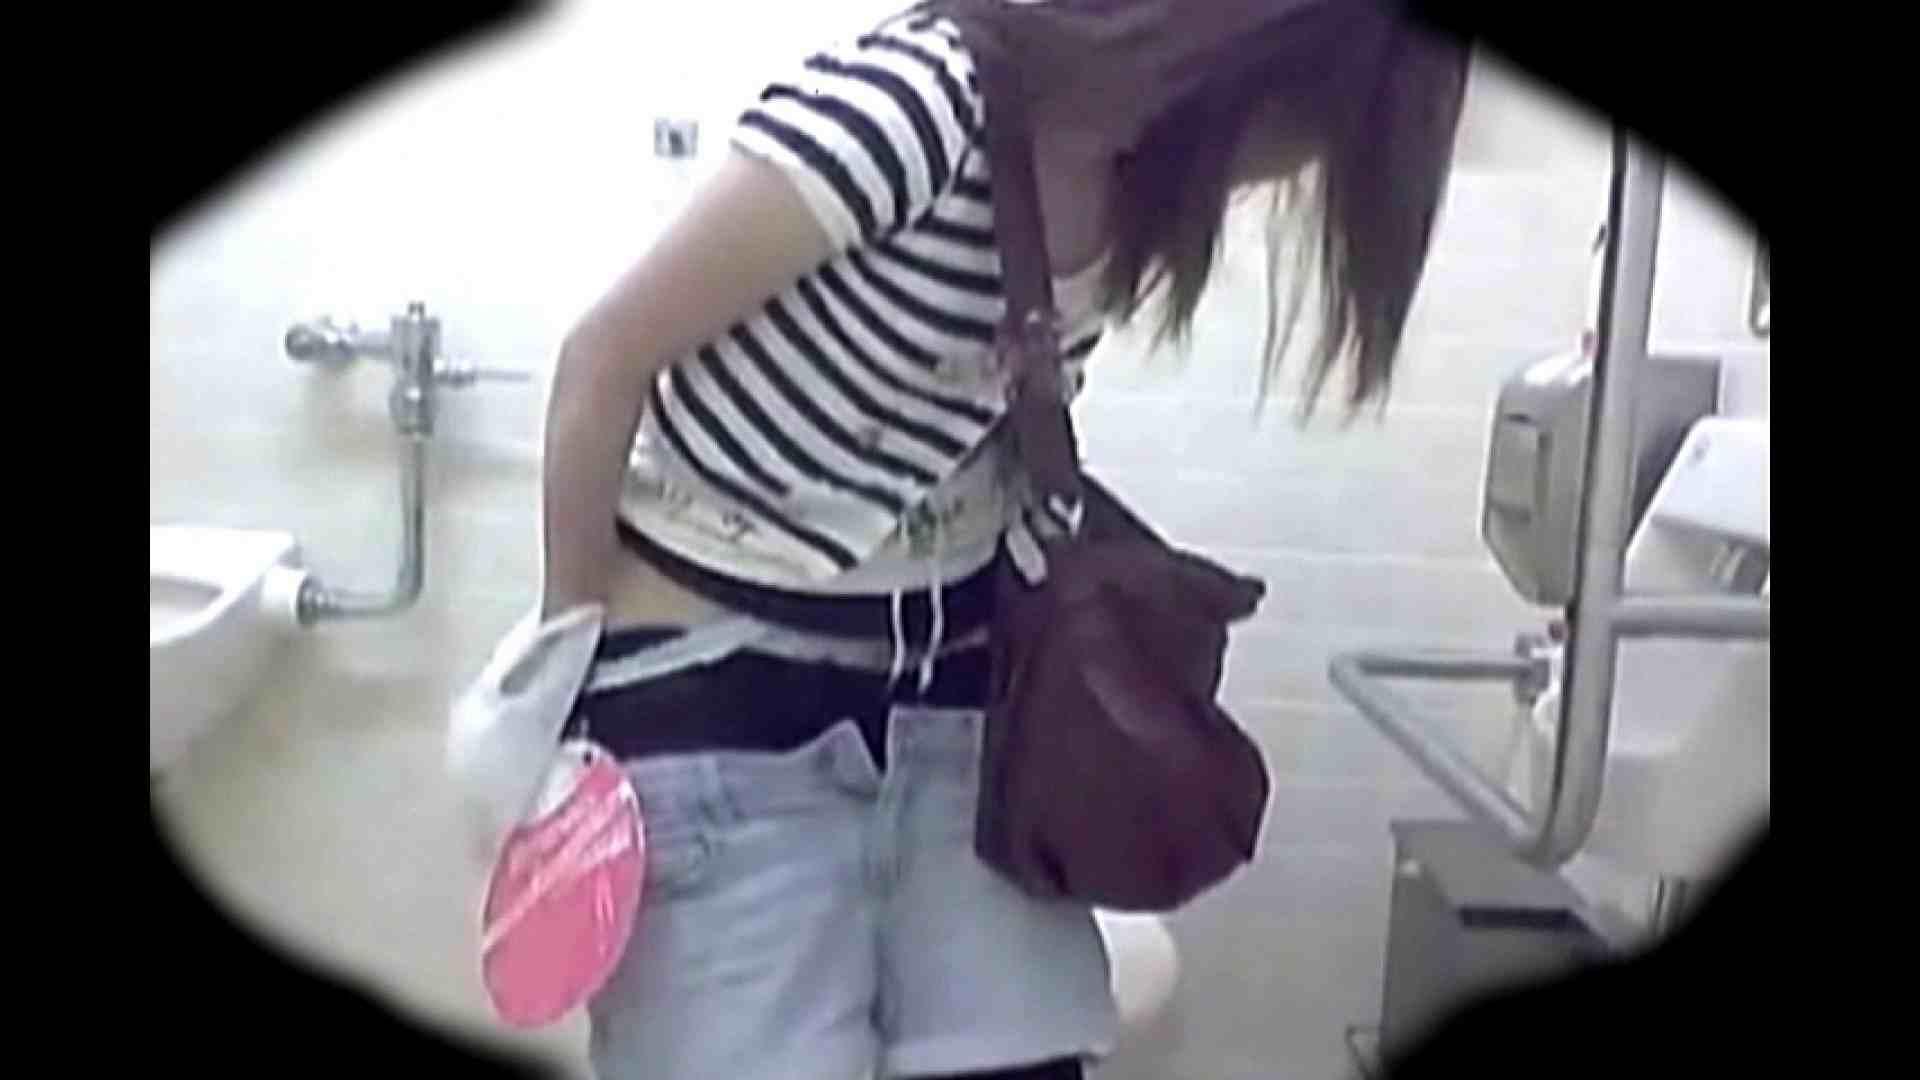 teen galトイレ覗き紙がナイ編‼vol.06 覗き スケベ動画紹介 82連発 58